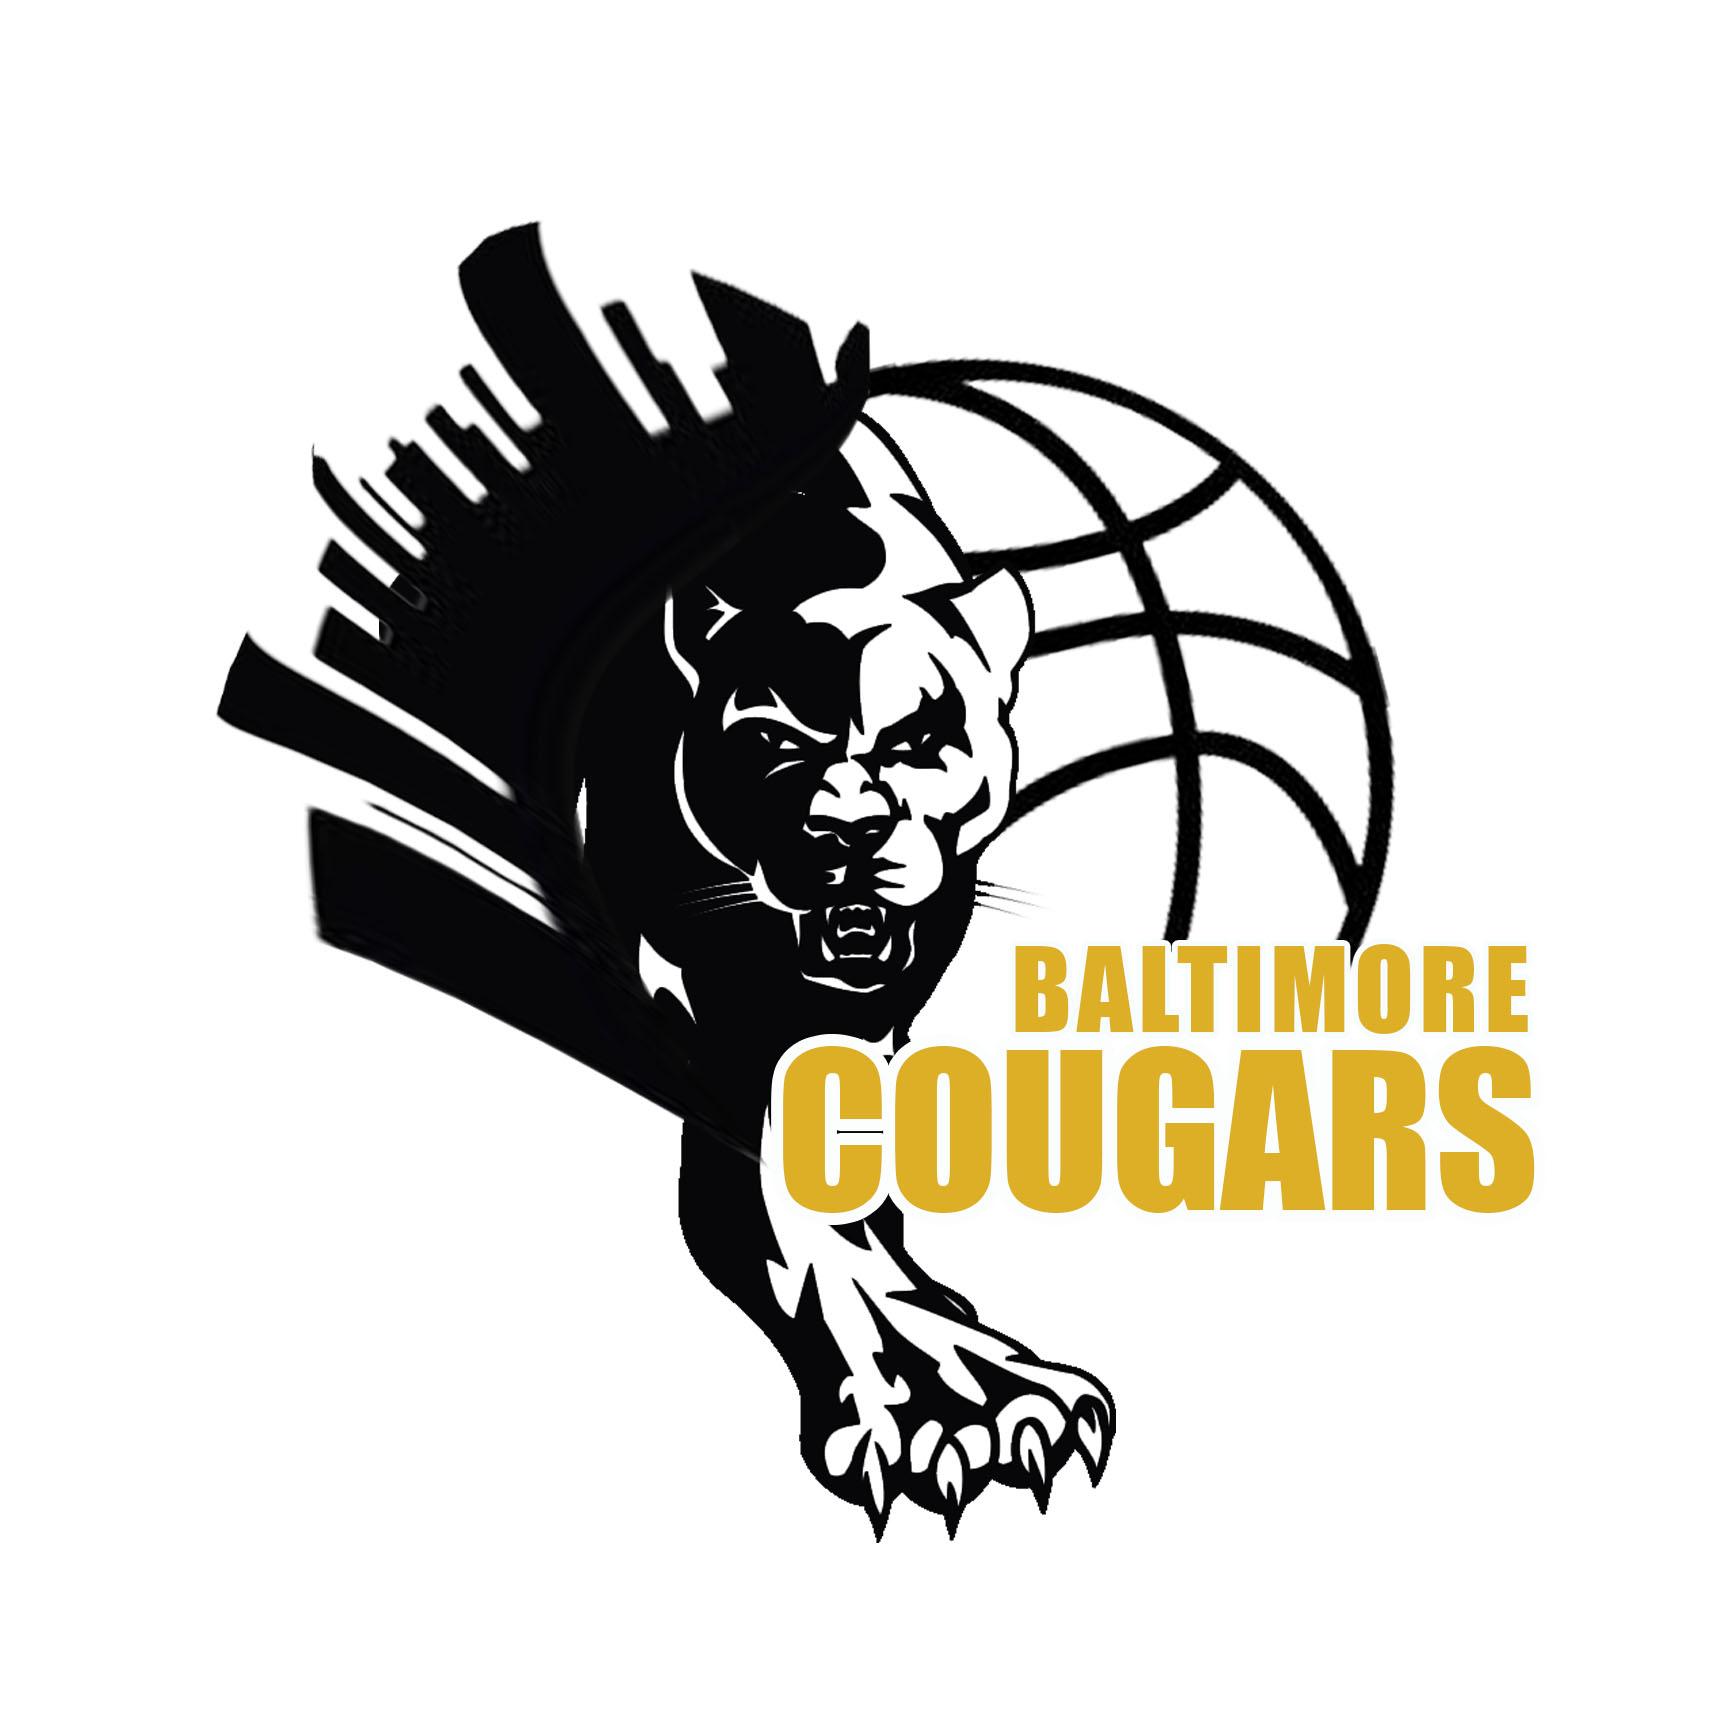 Baltimore cougars